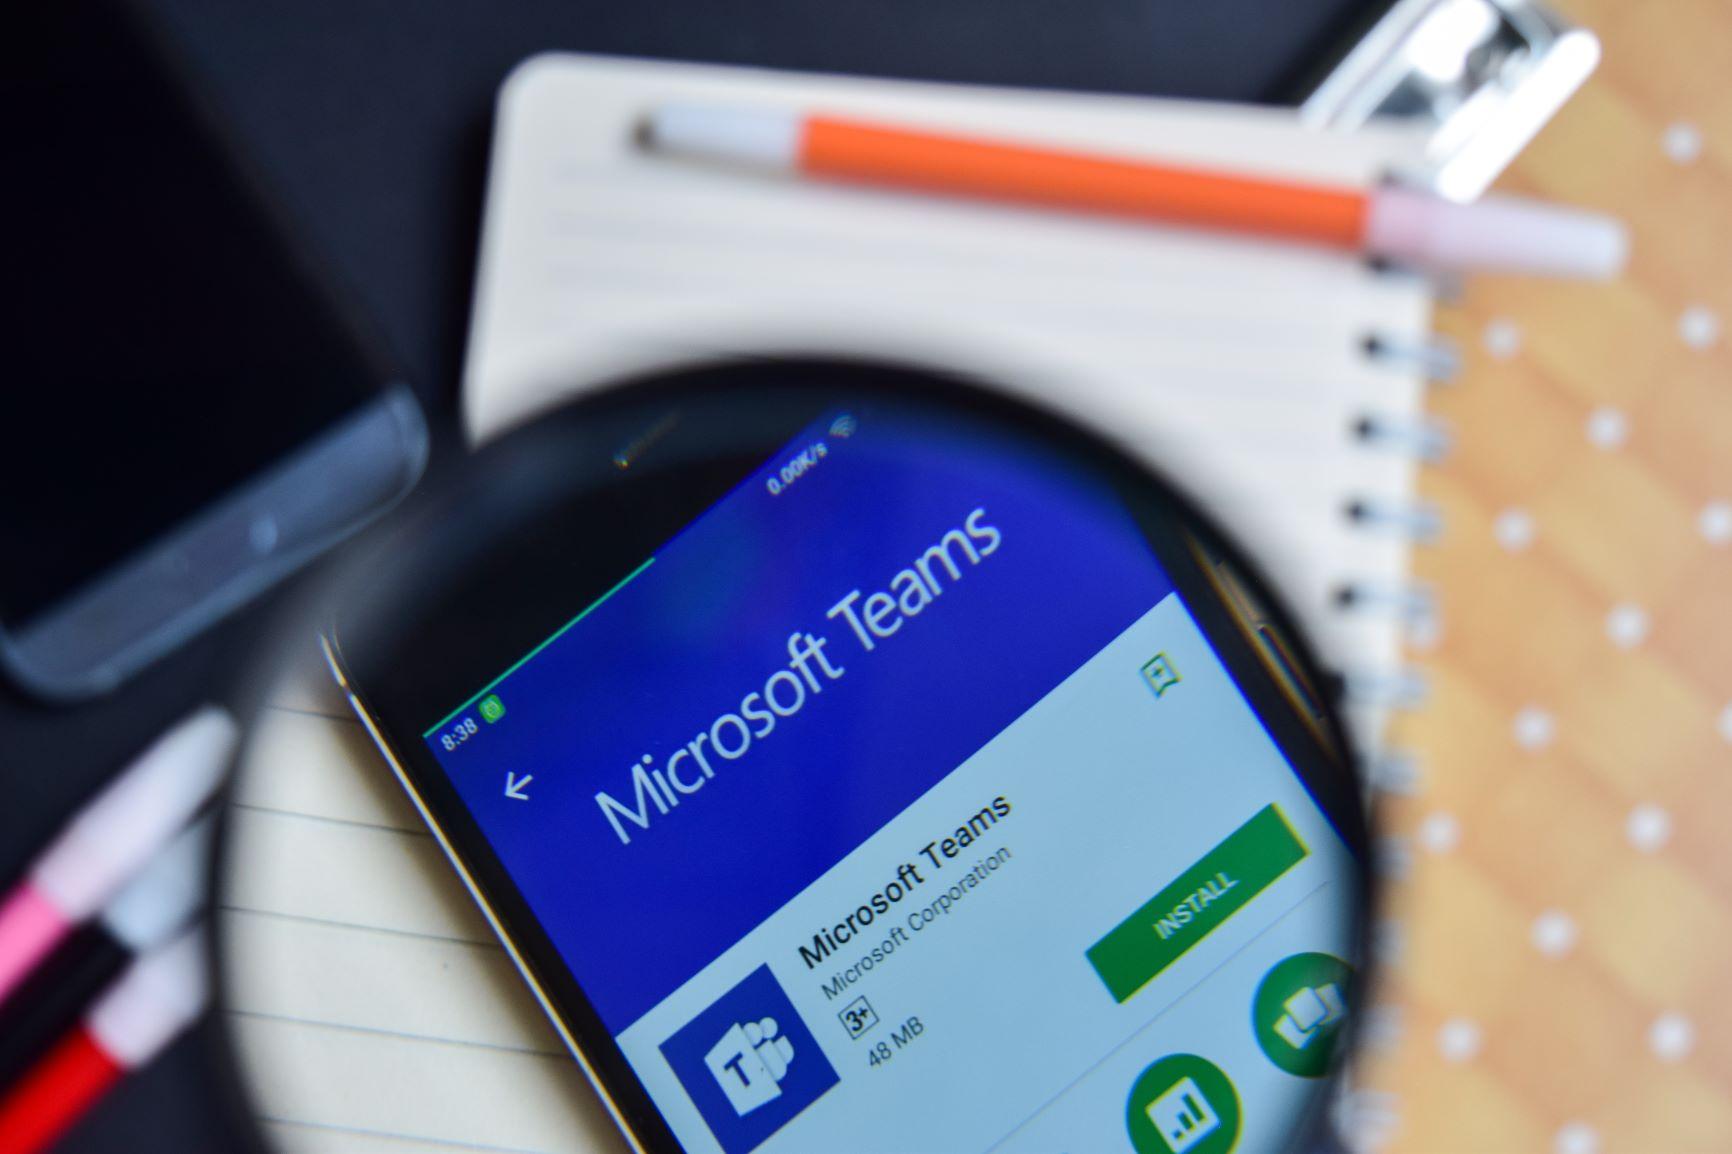 Voice of Microsoft Teams